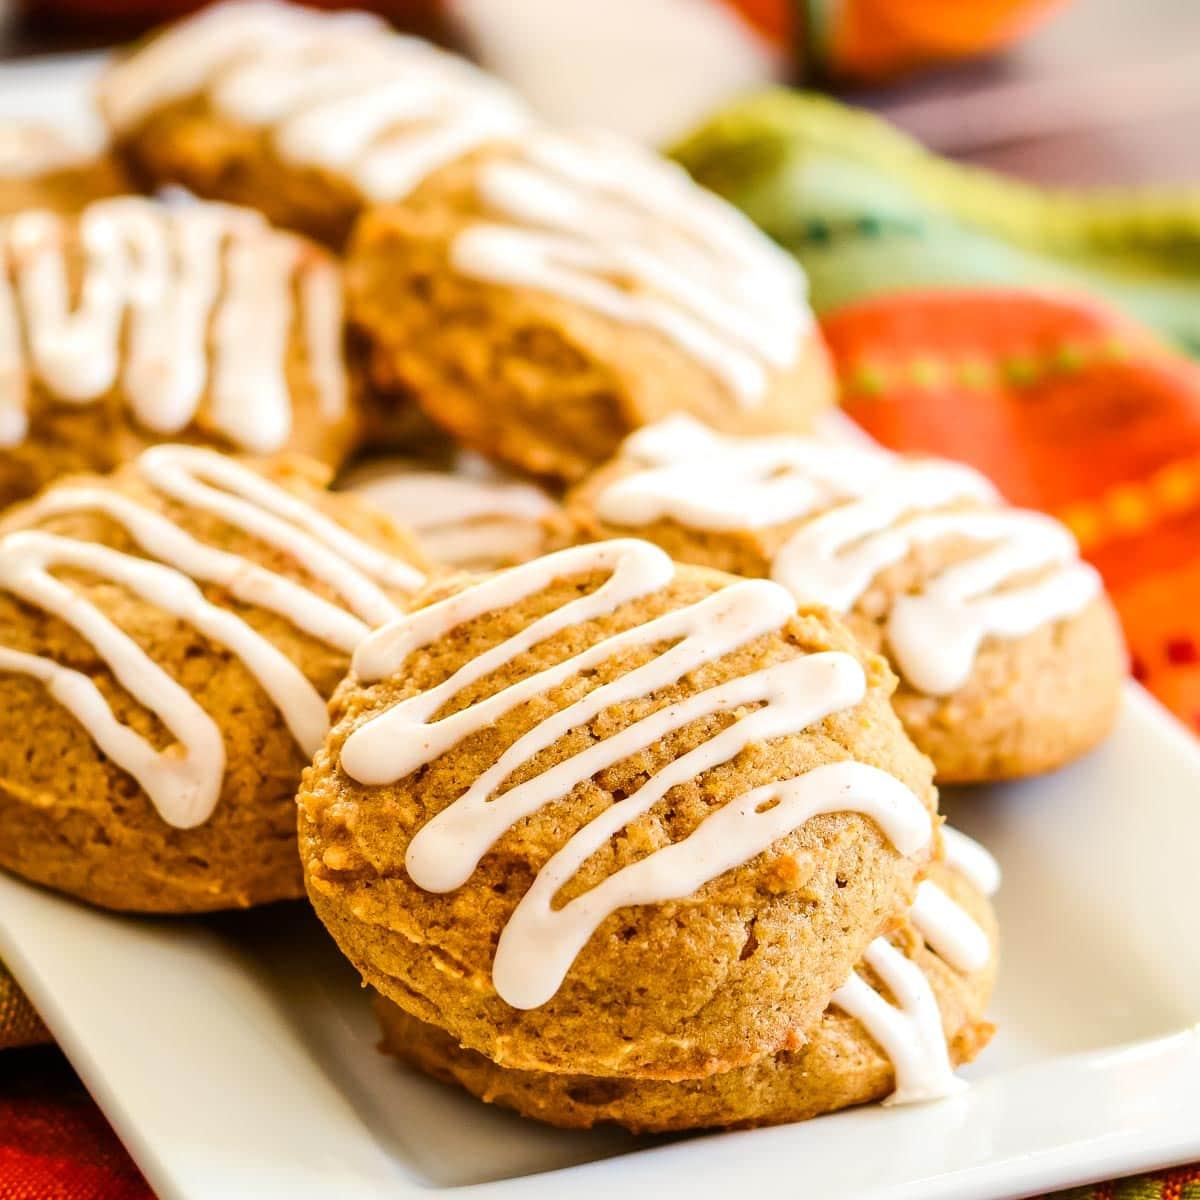 Iced pumpkin cookies on plate